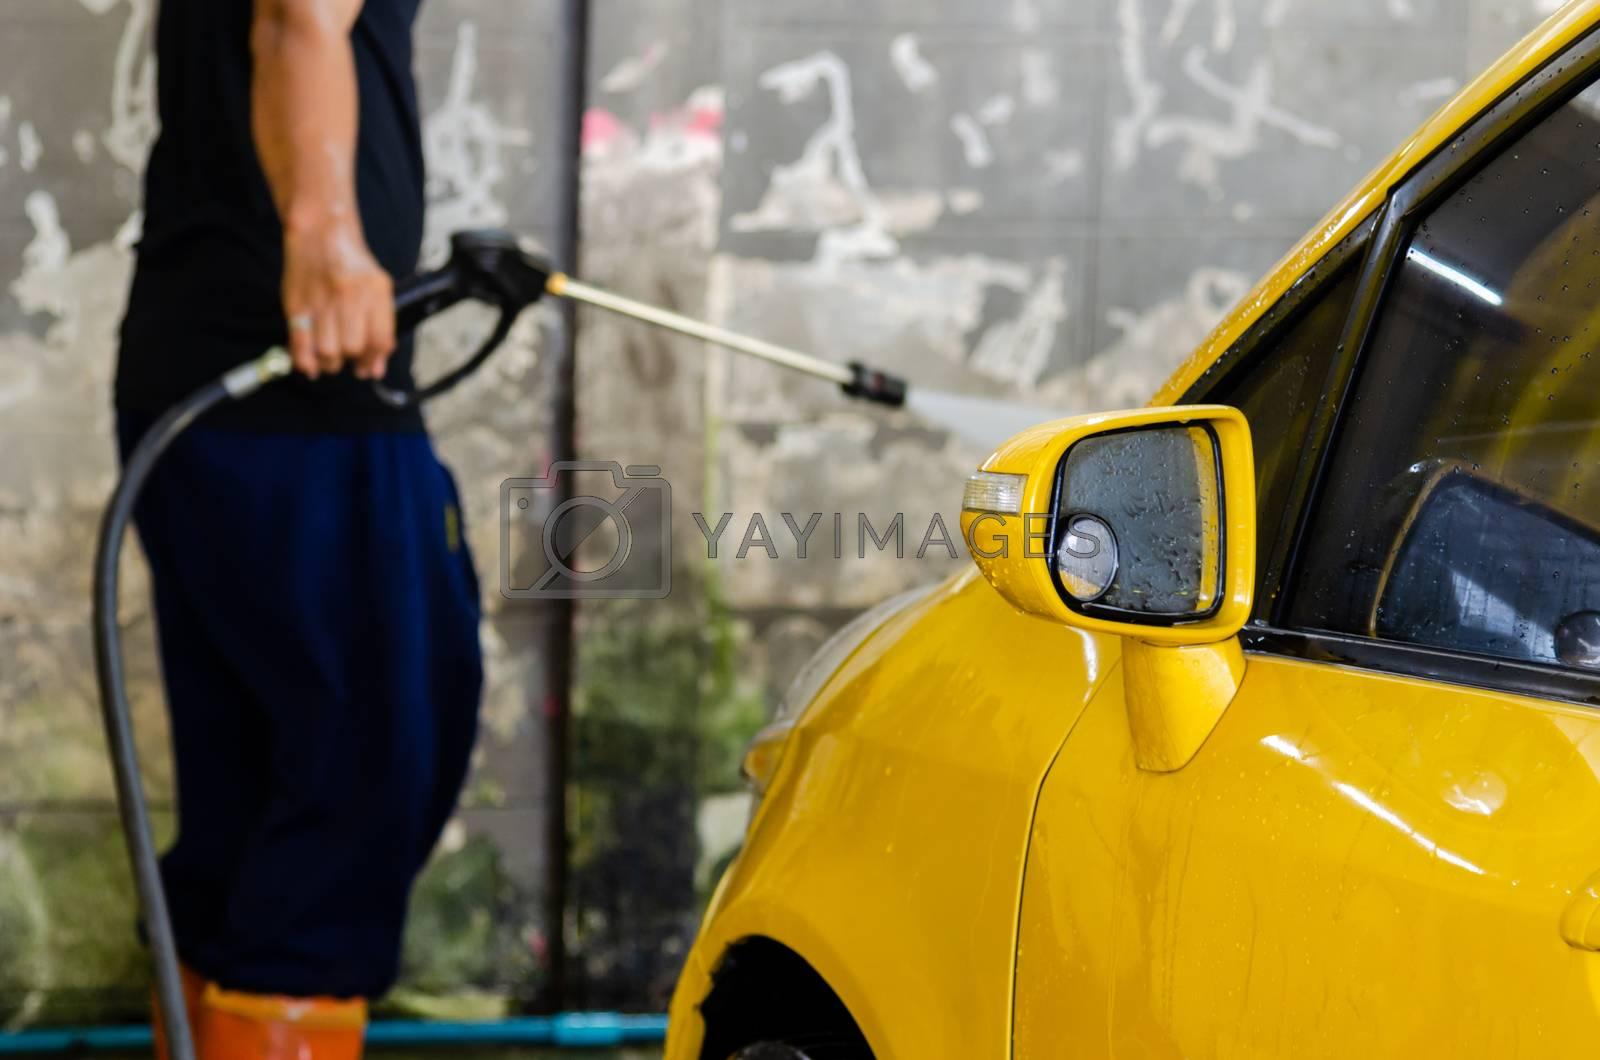 man with a high pressure car wash water gun.Yellow cars are washing cars at Car Care.